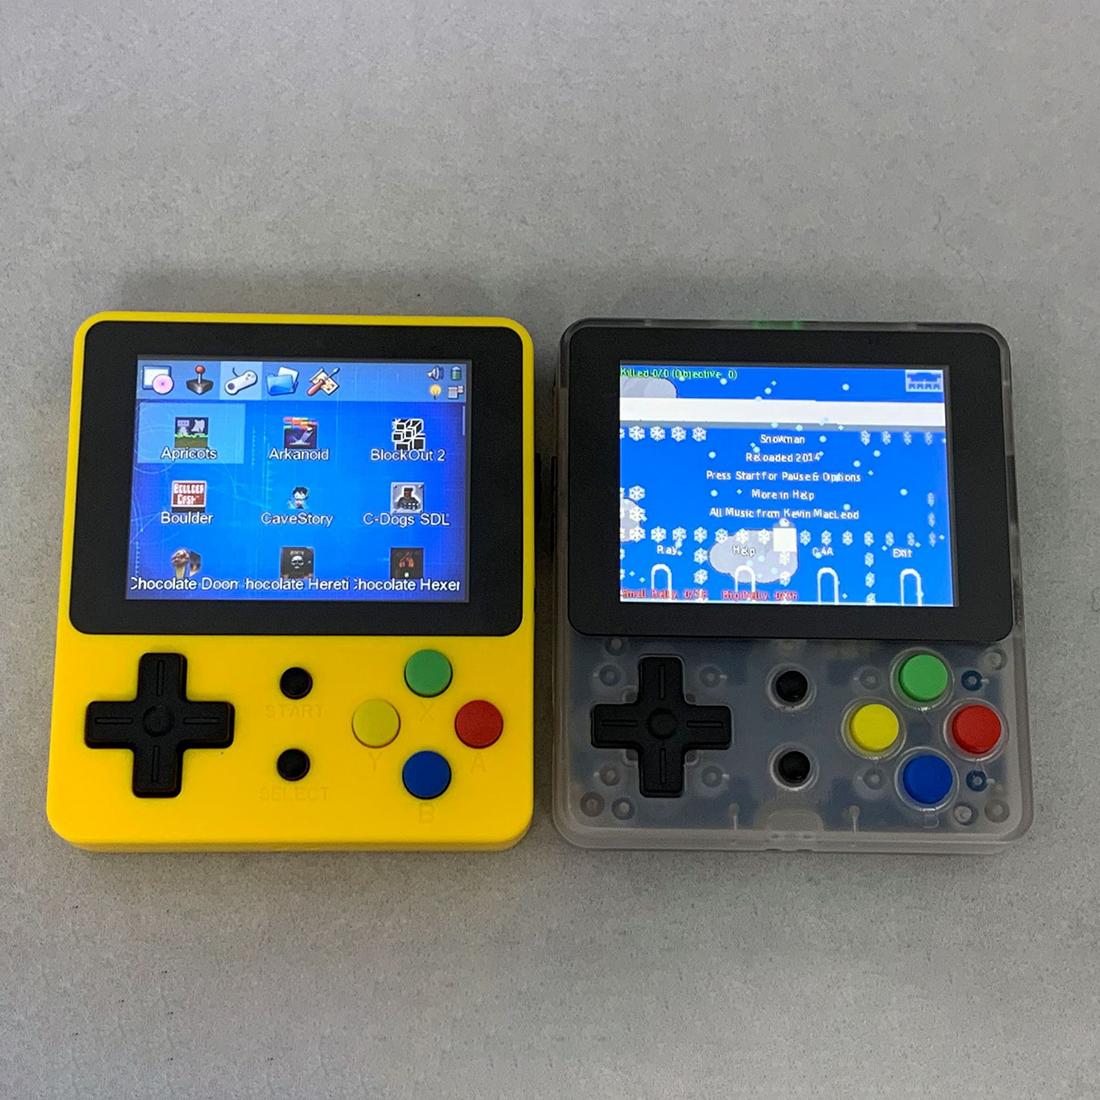 16G Handheld Arcade Game Console Mini Game Machine Game Player for Children